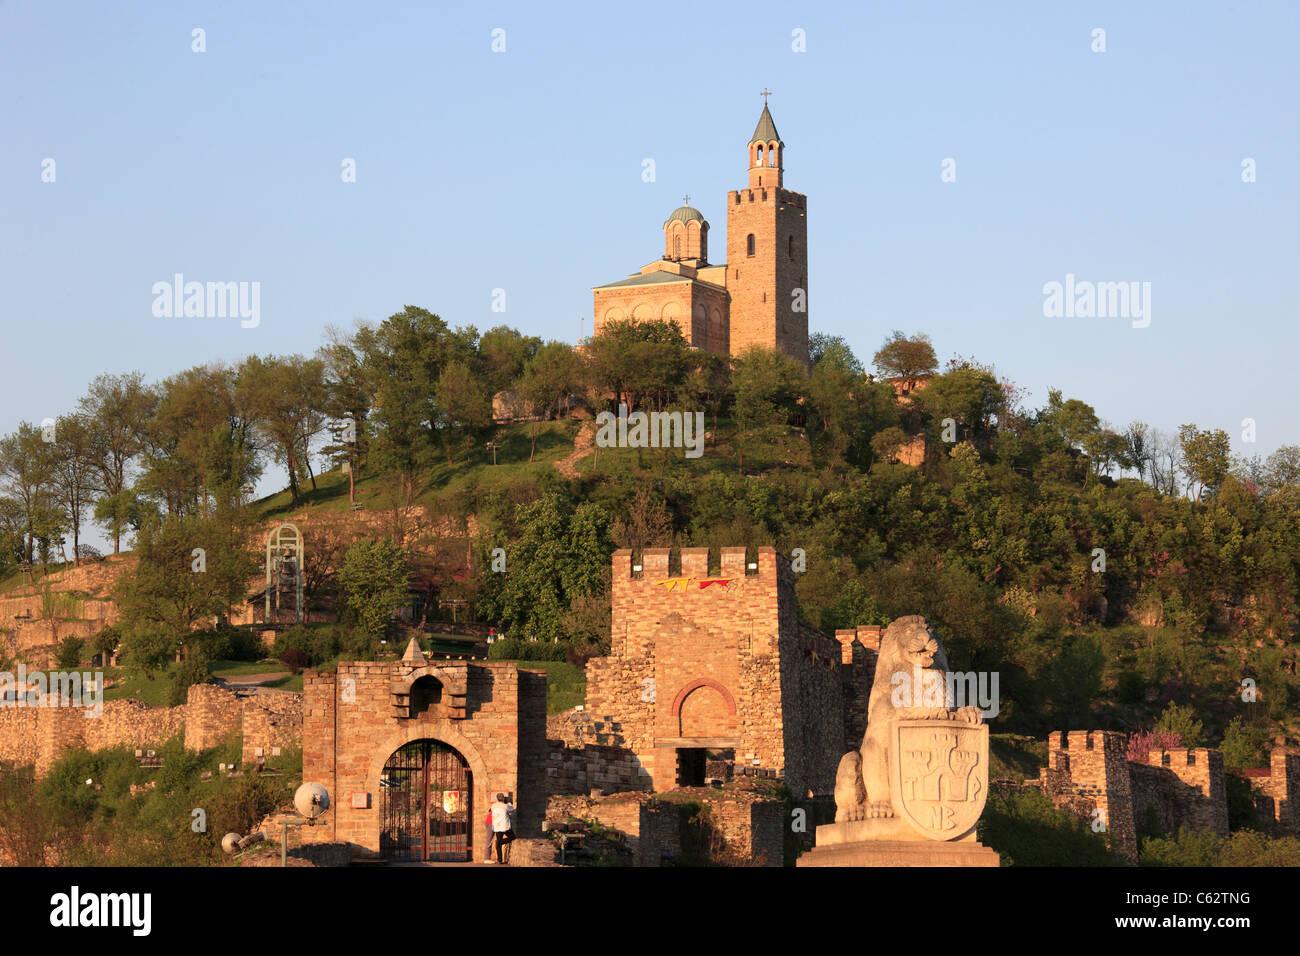 Bulgaria, Veliko Tarnovo, Tsarevets fortress, Church of the Patriarchate, Stock Photo